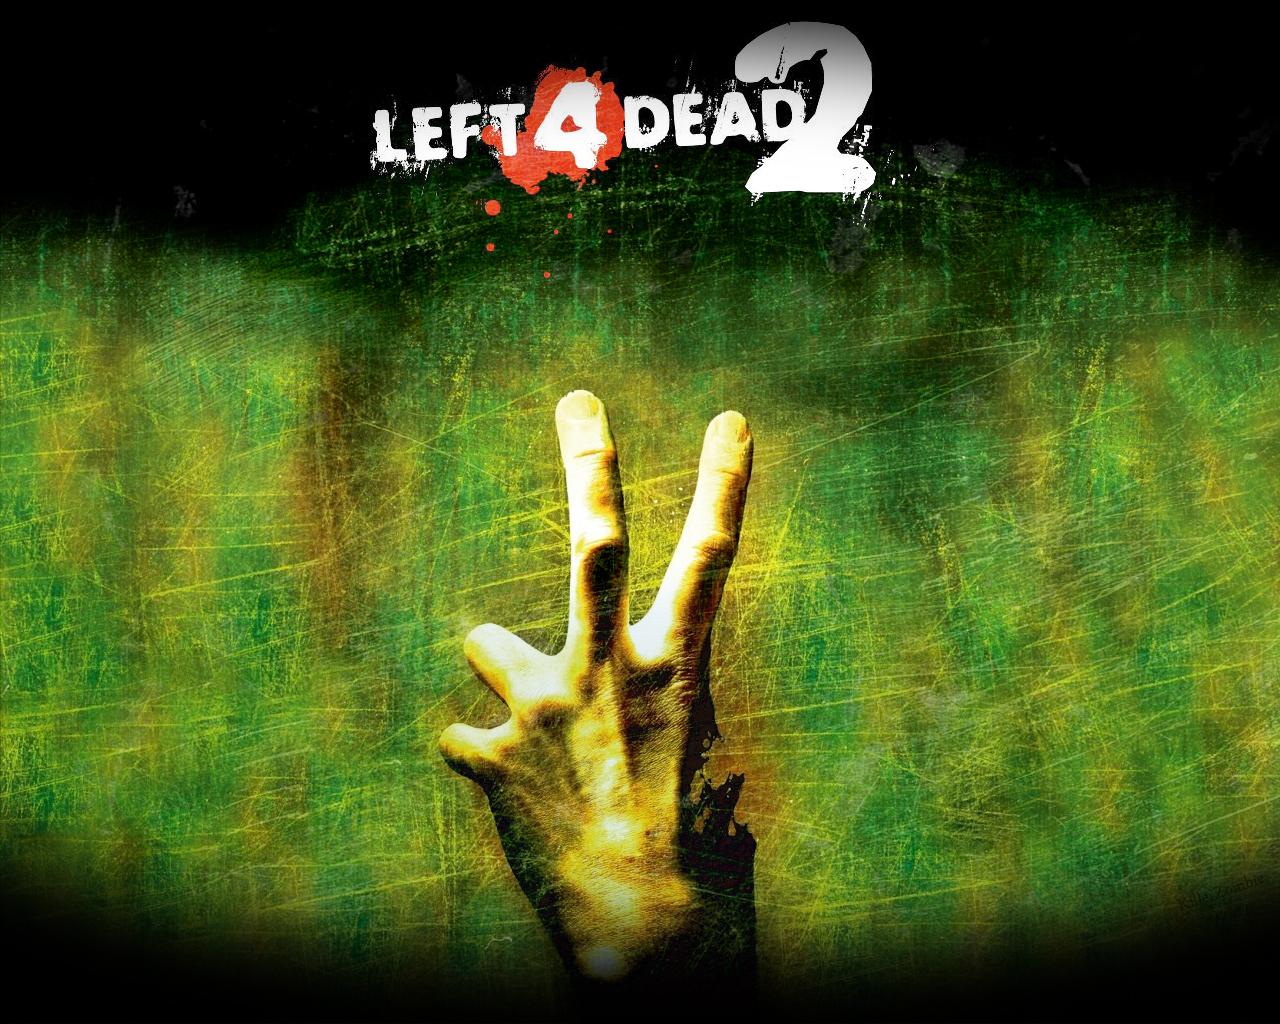 Left 4 Dead 2 Free Download Gametrex